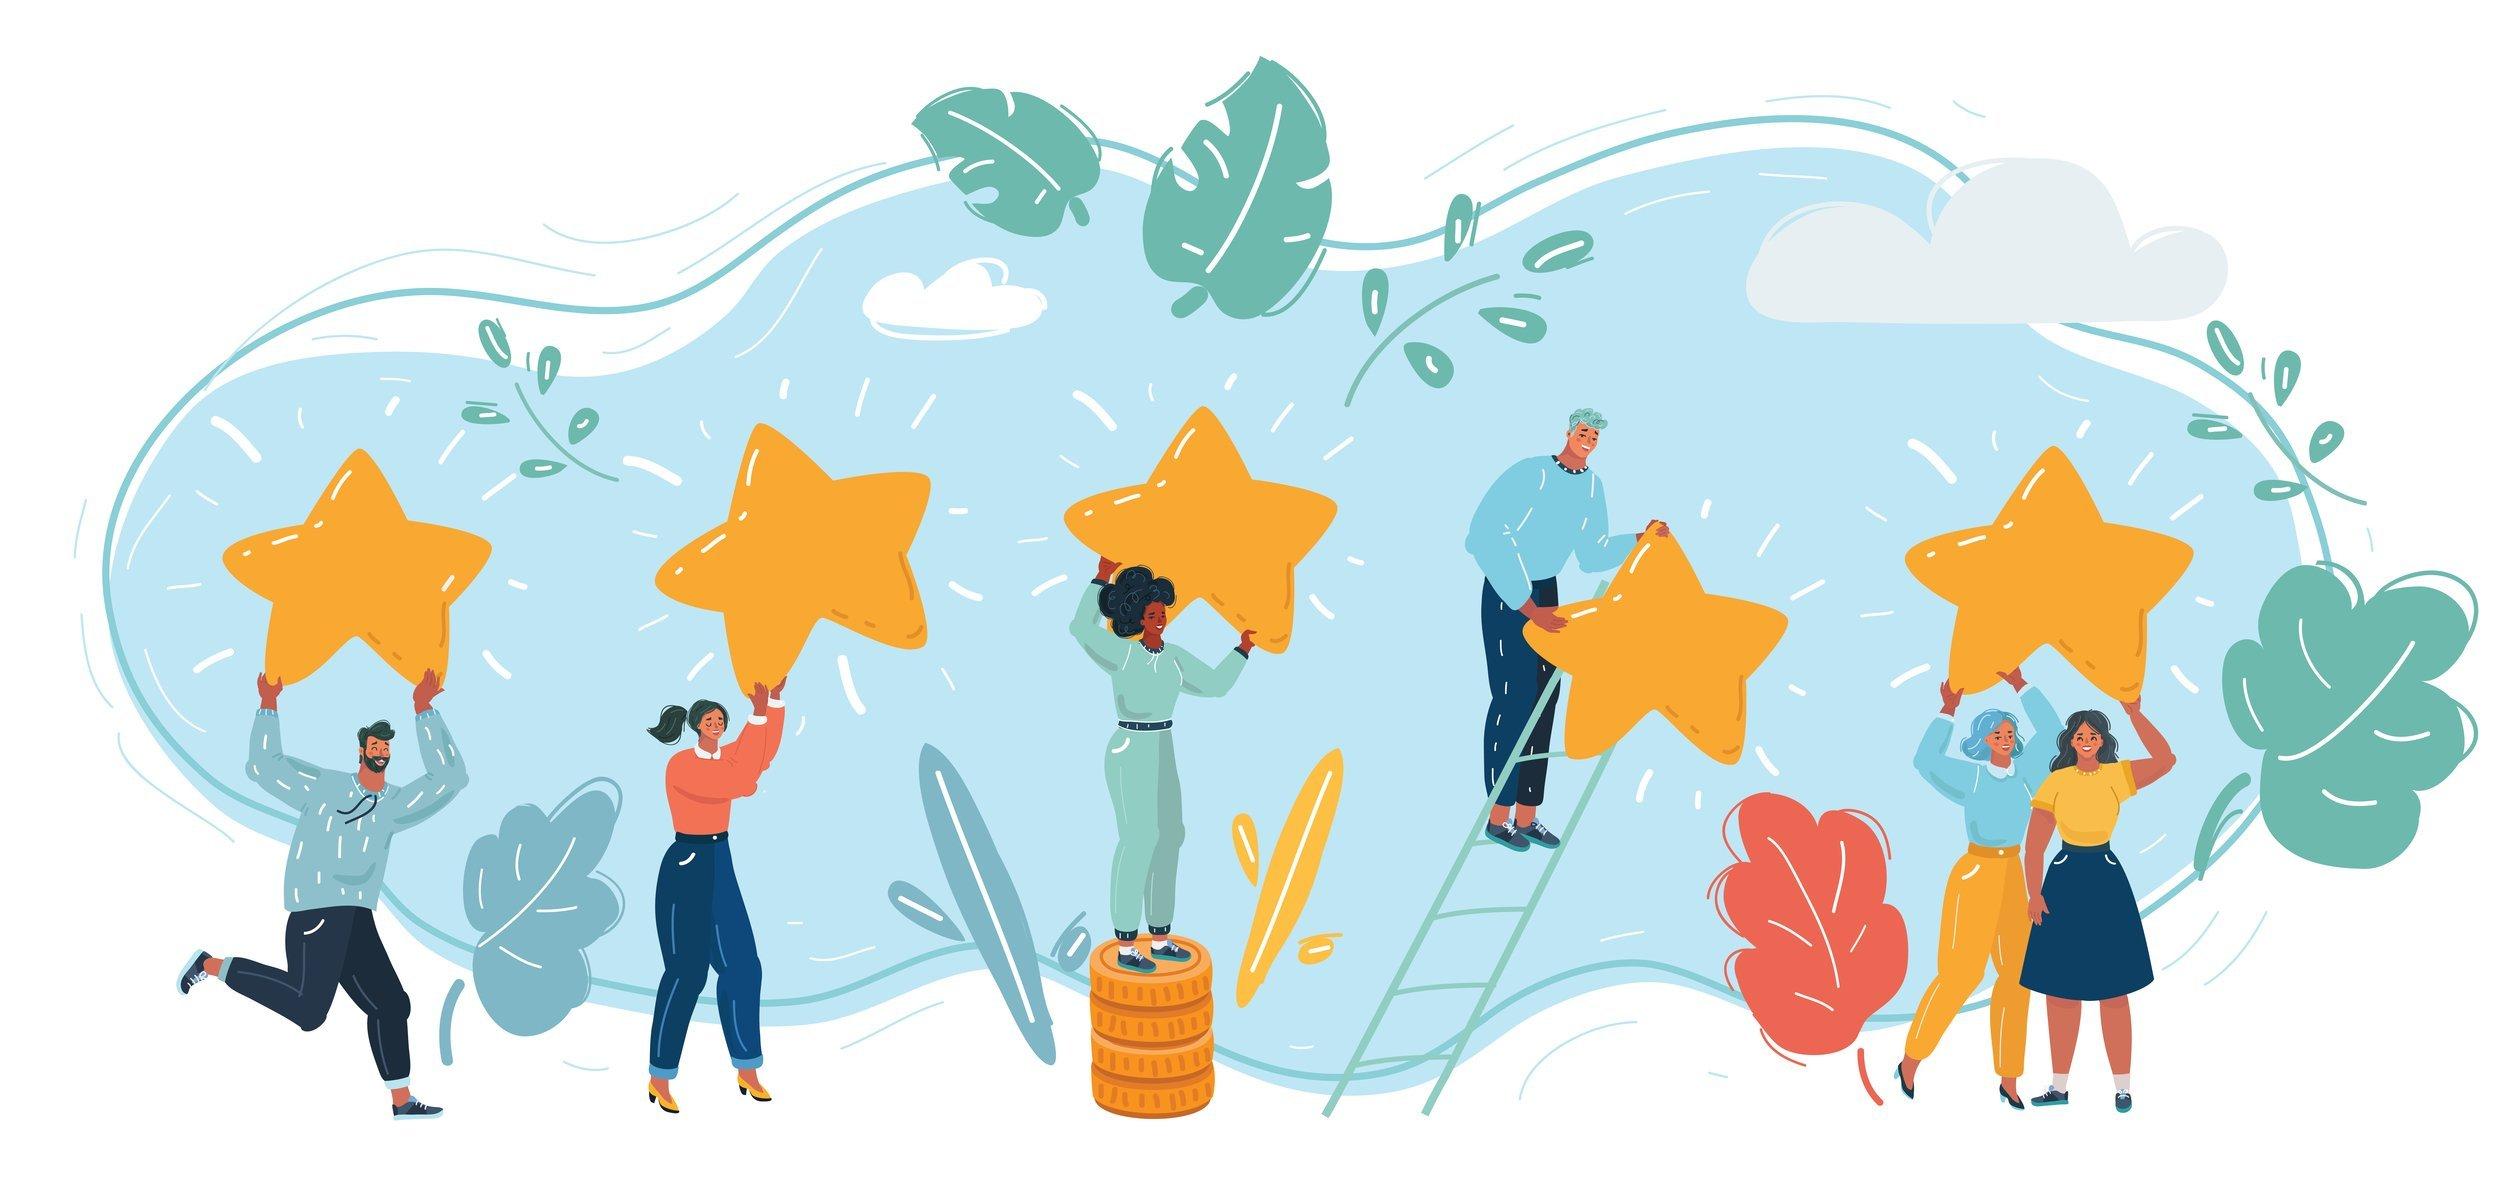 Celebrating Customer Service Successes illustration